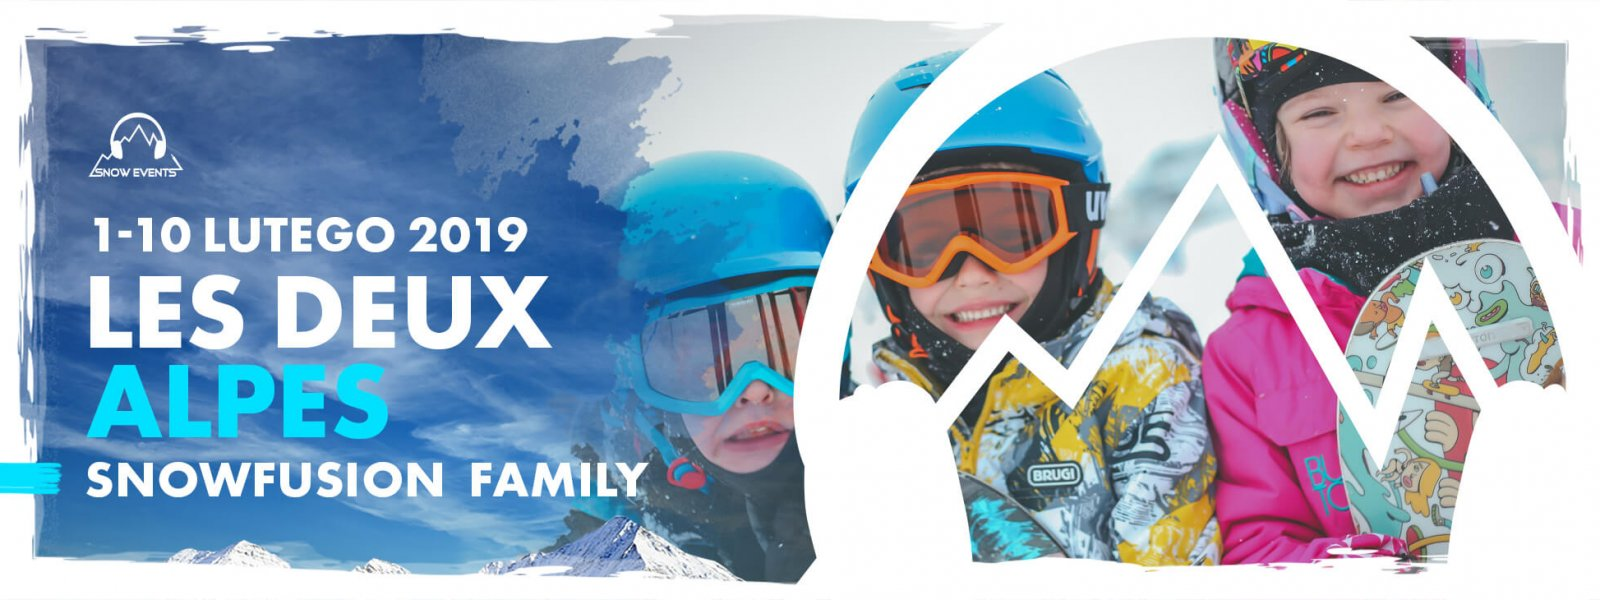 snowfusion family